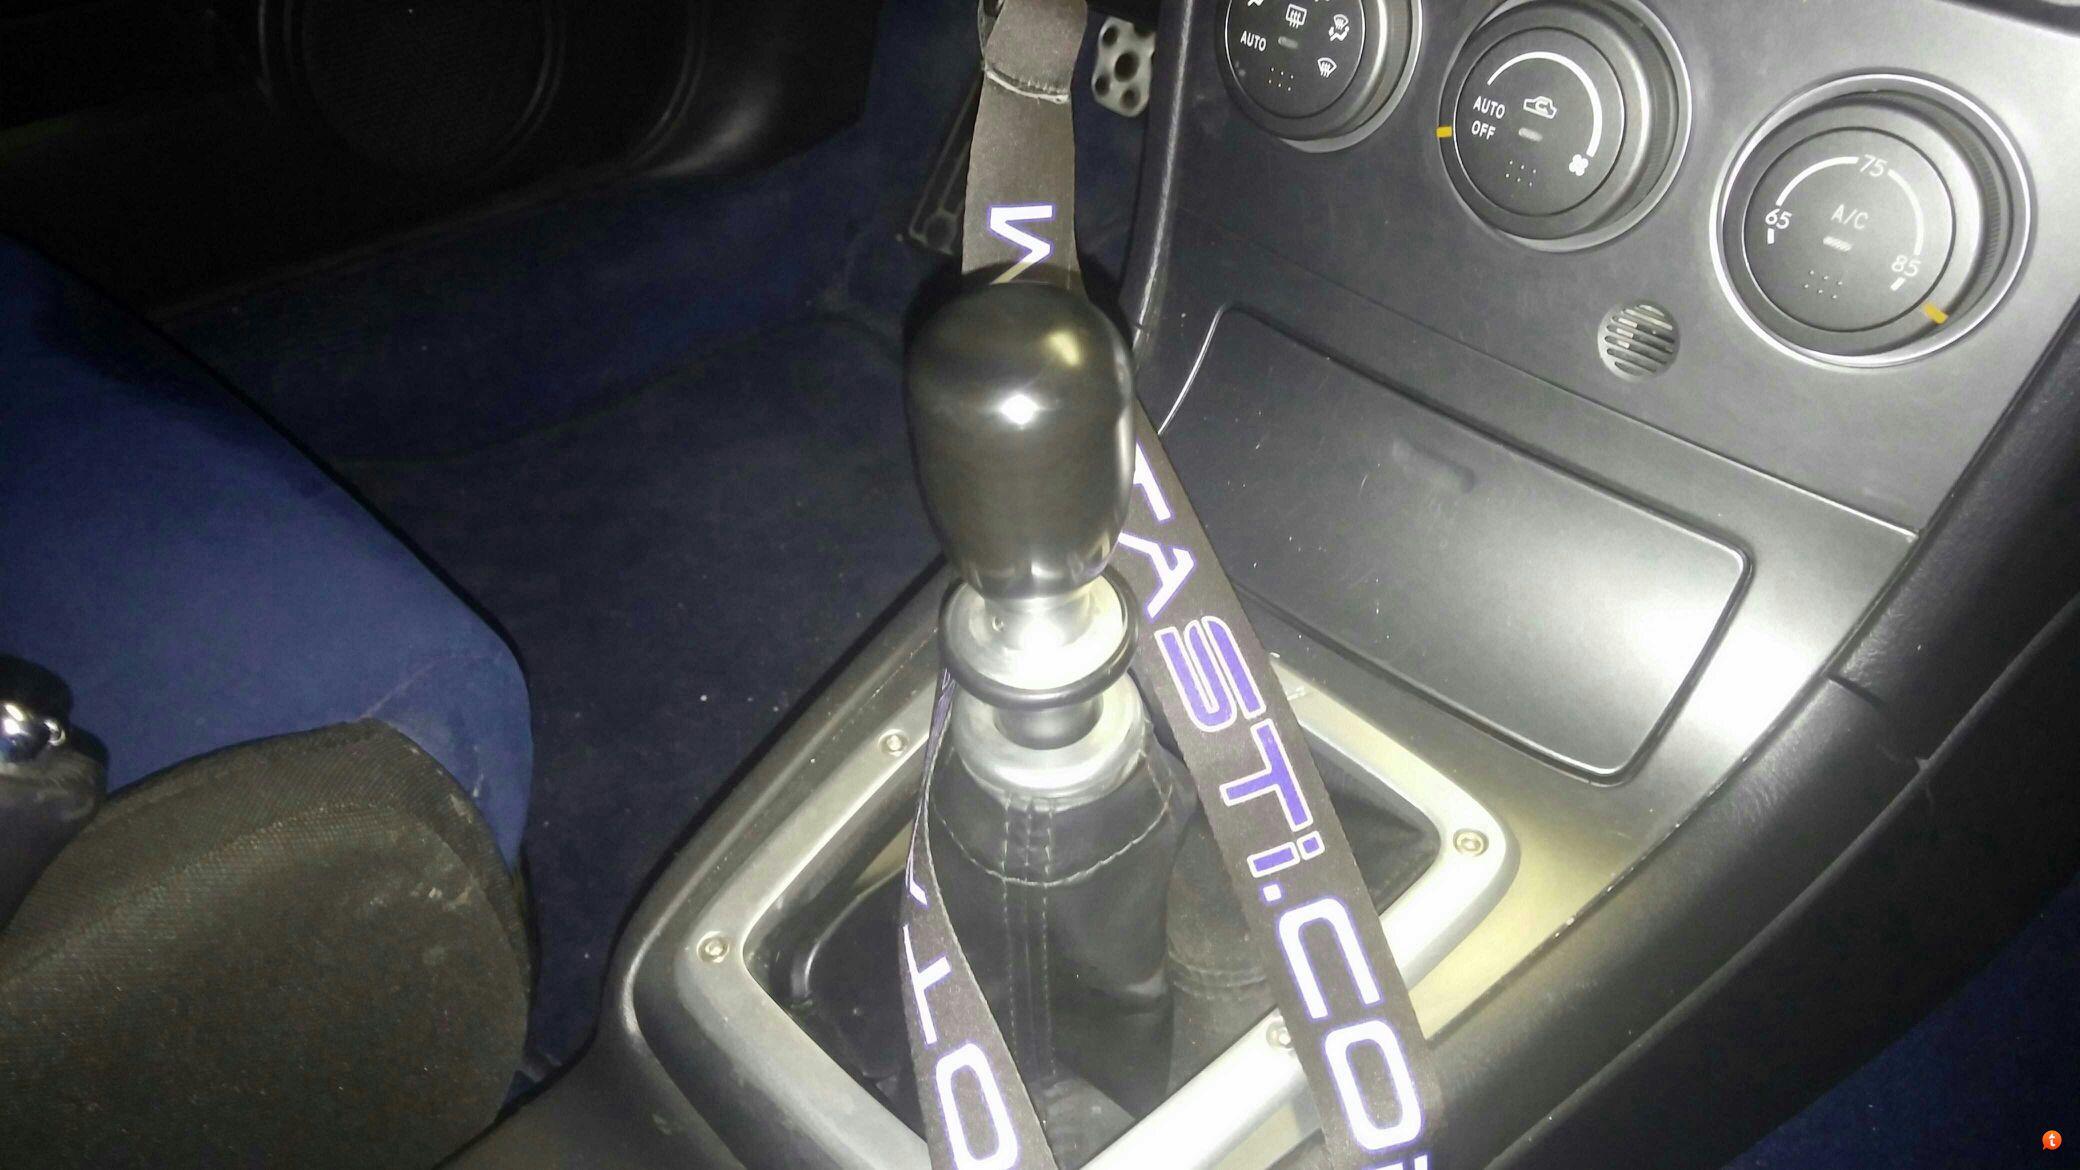 KillerB type R shift knob